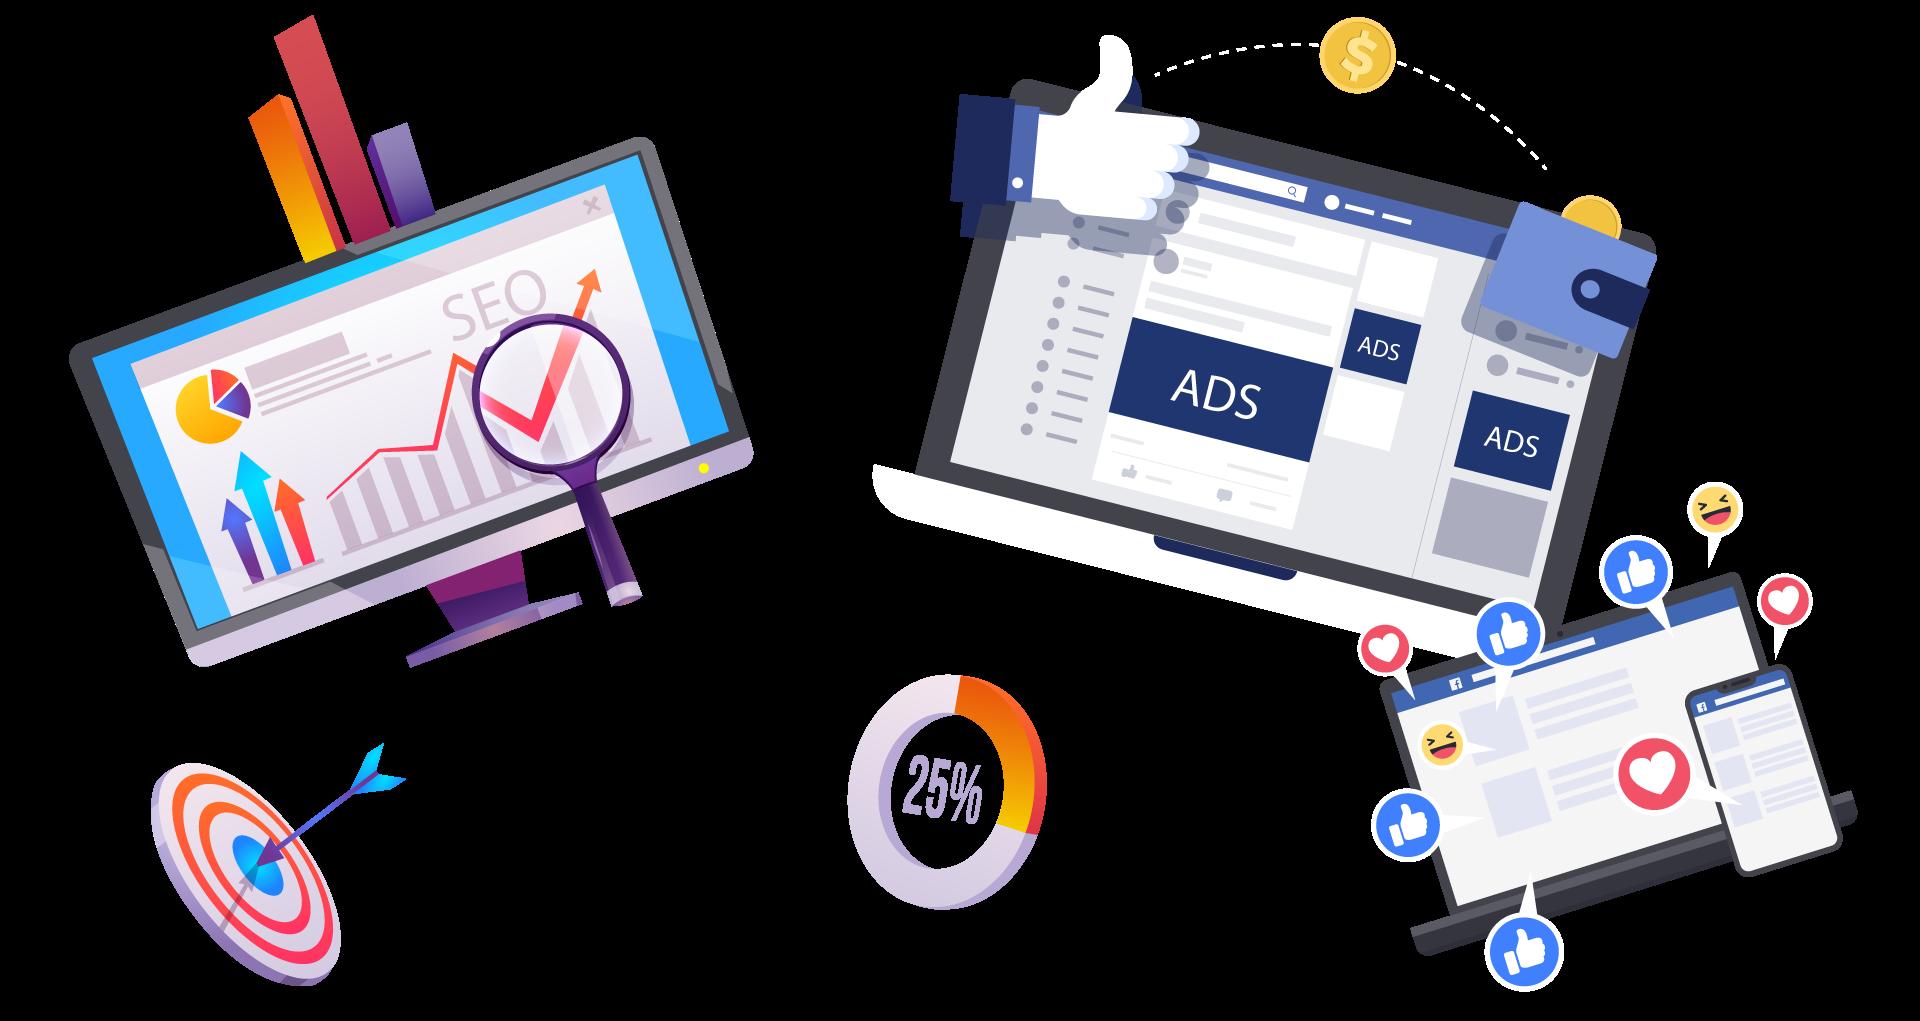 MaximeDoit - Communication & Marketing